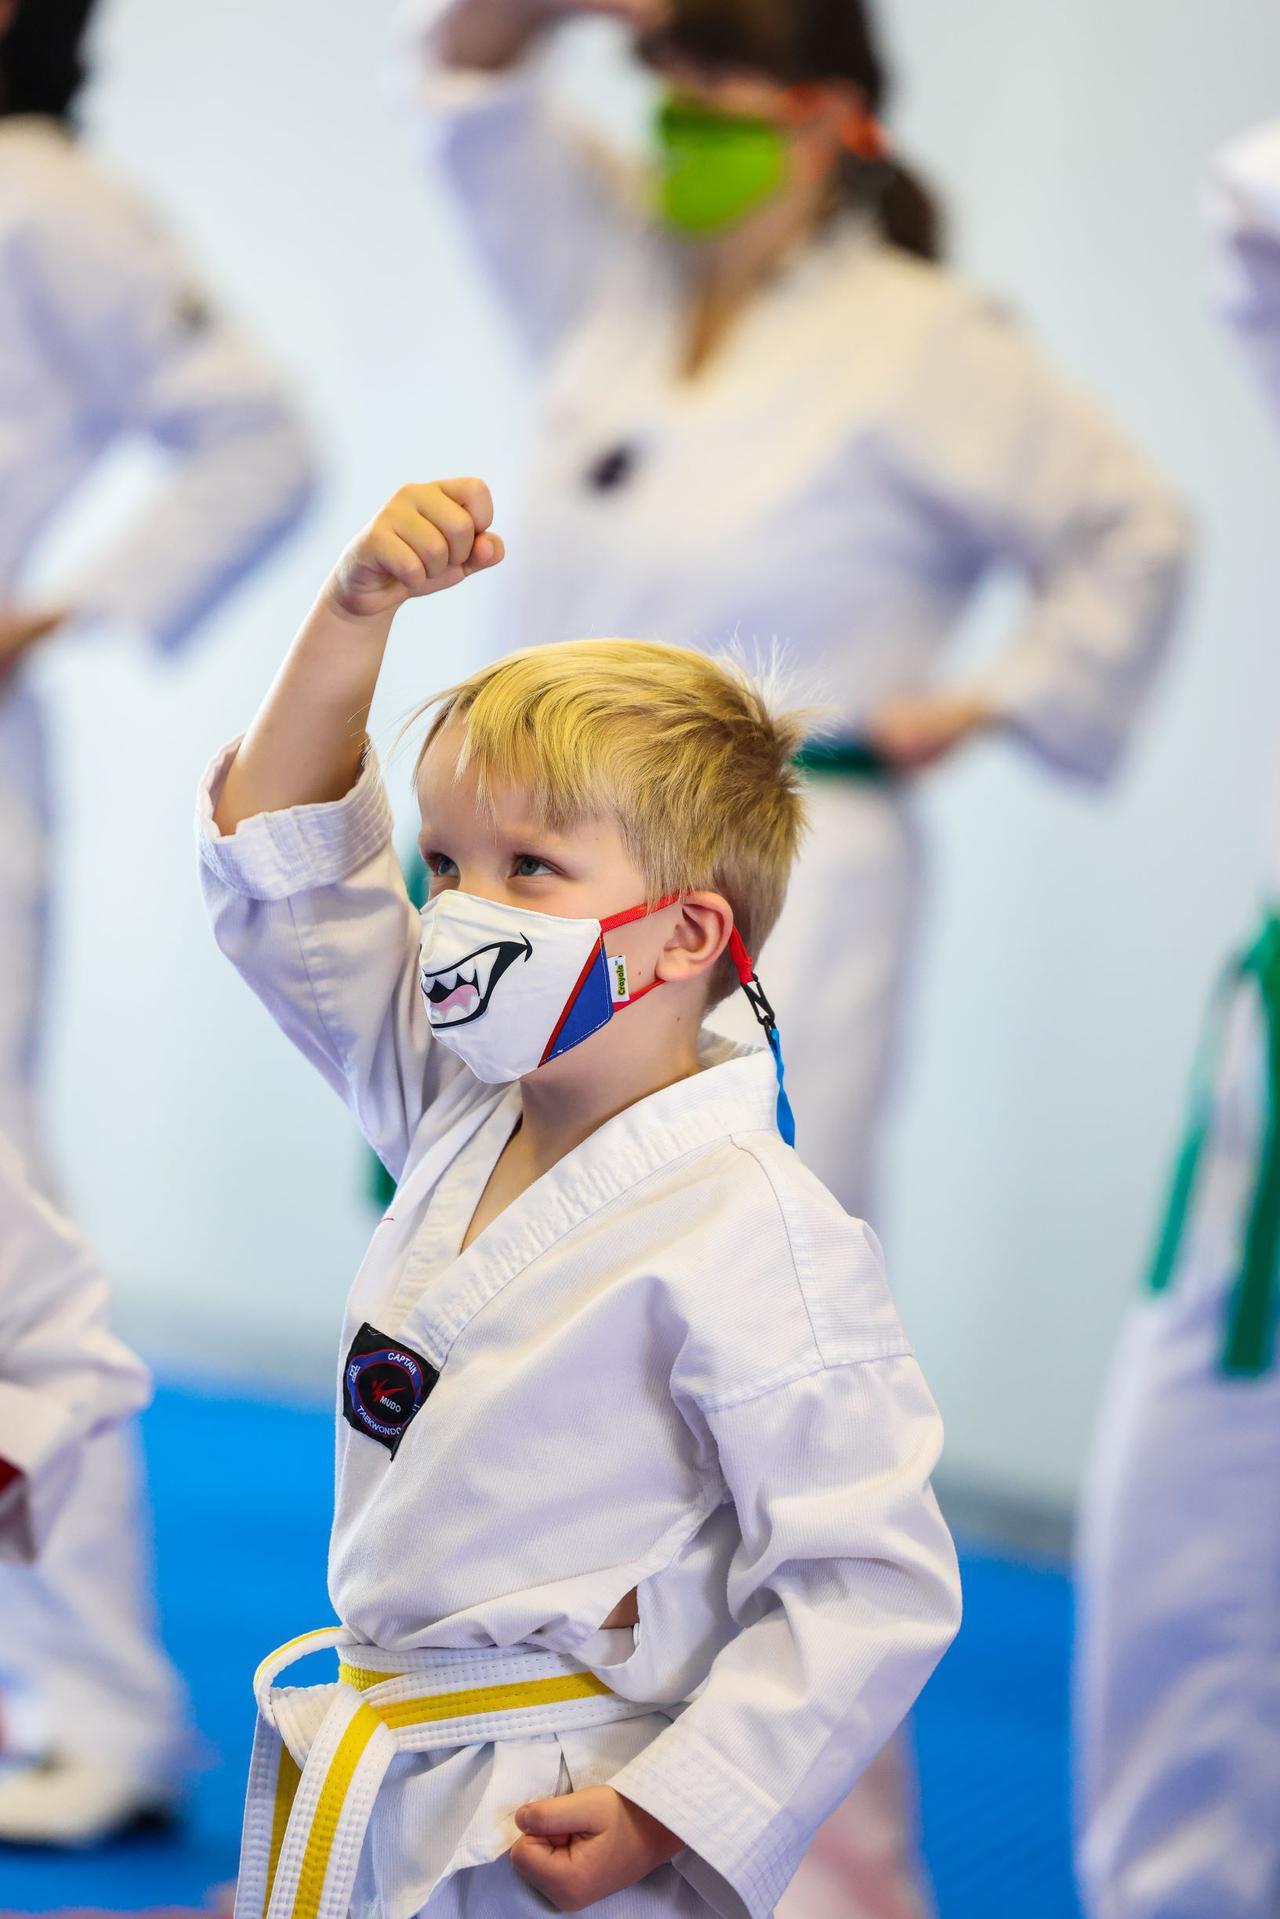 Redpx_Parent_Child_Taekwondo.jpg